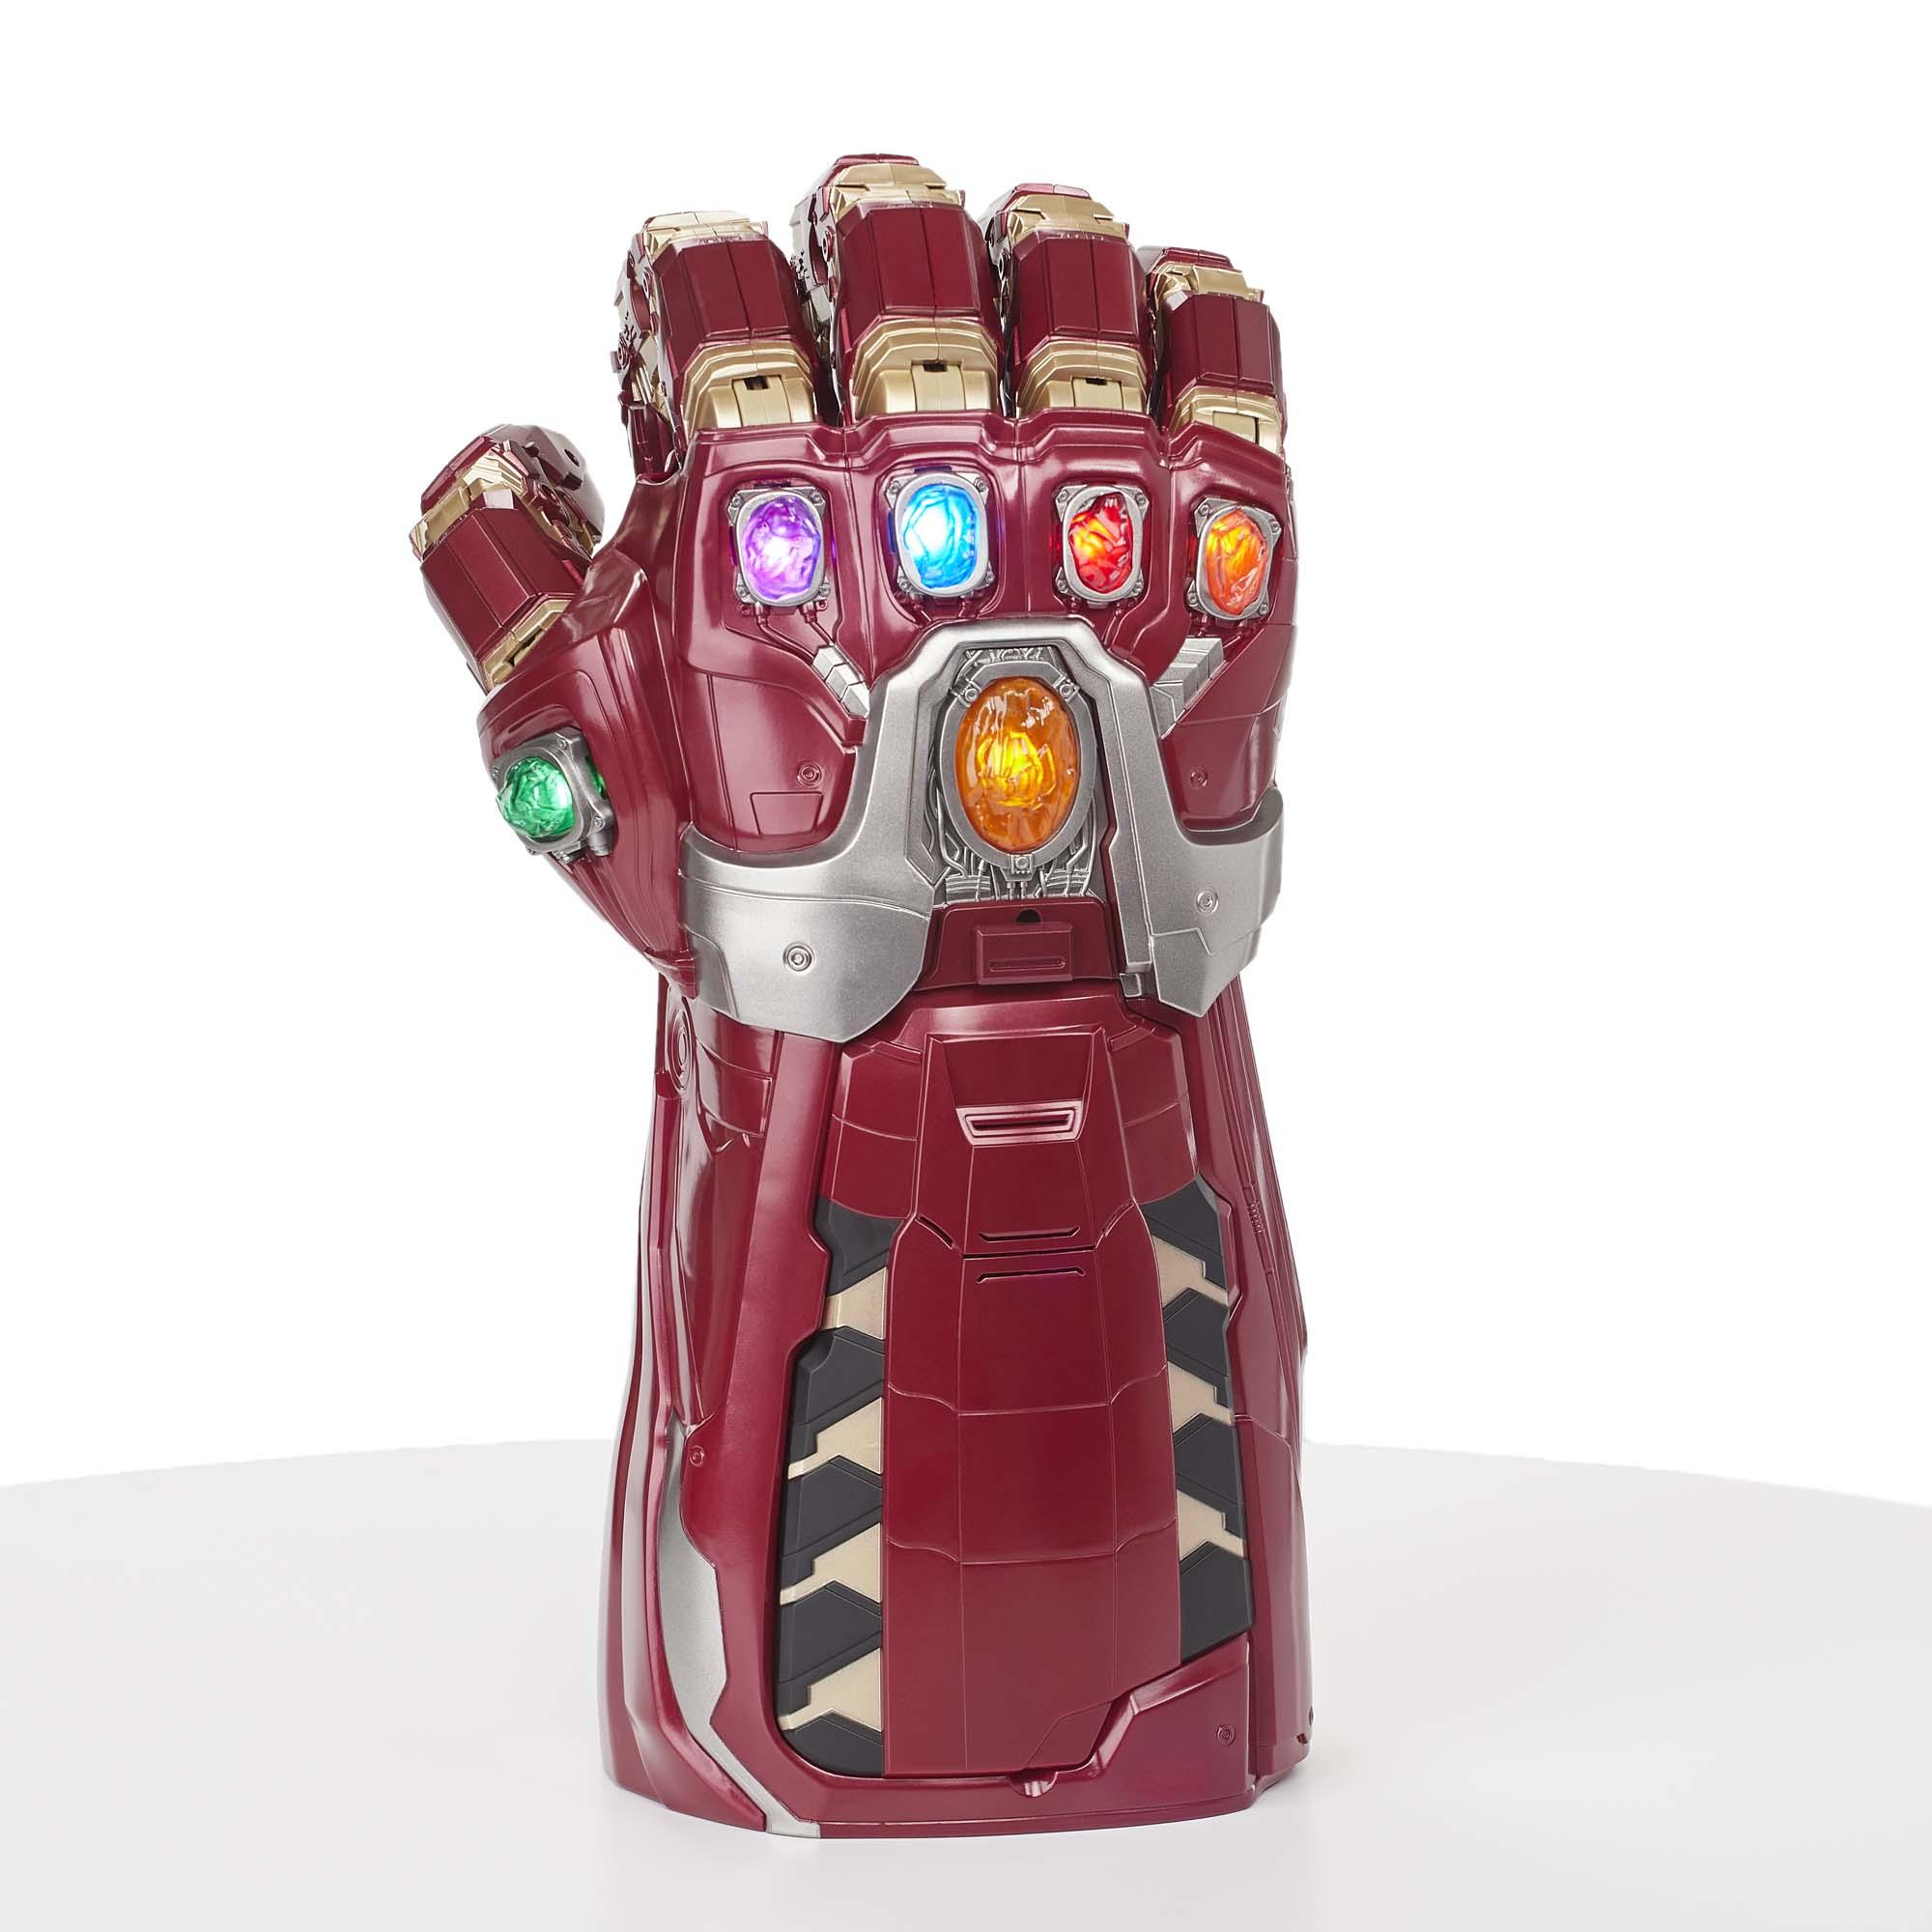 Marvel Legends Series Avengers Endgame Electronic Infinity Power Gauntlet $49.99